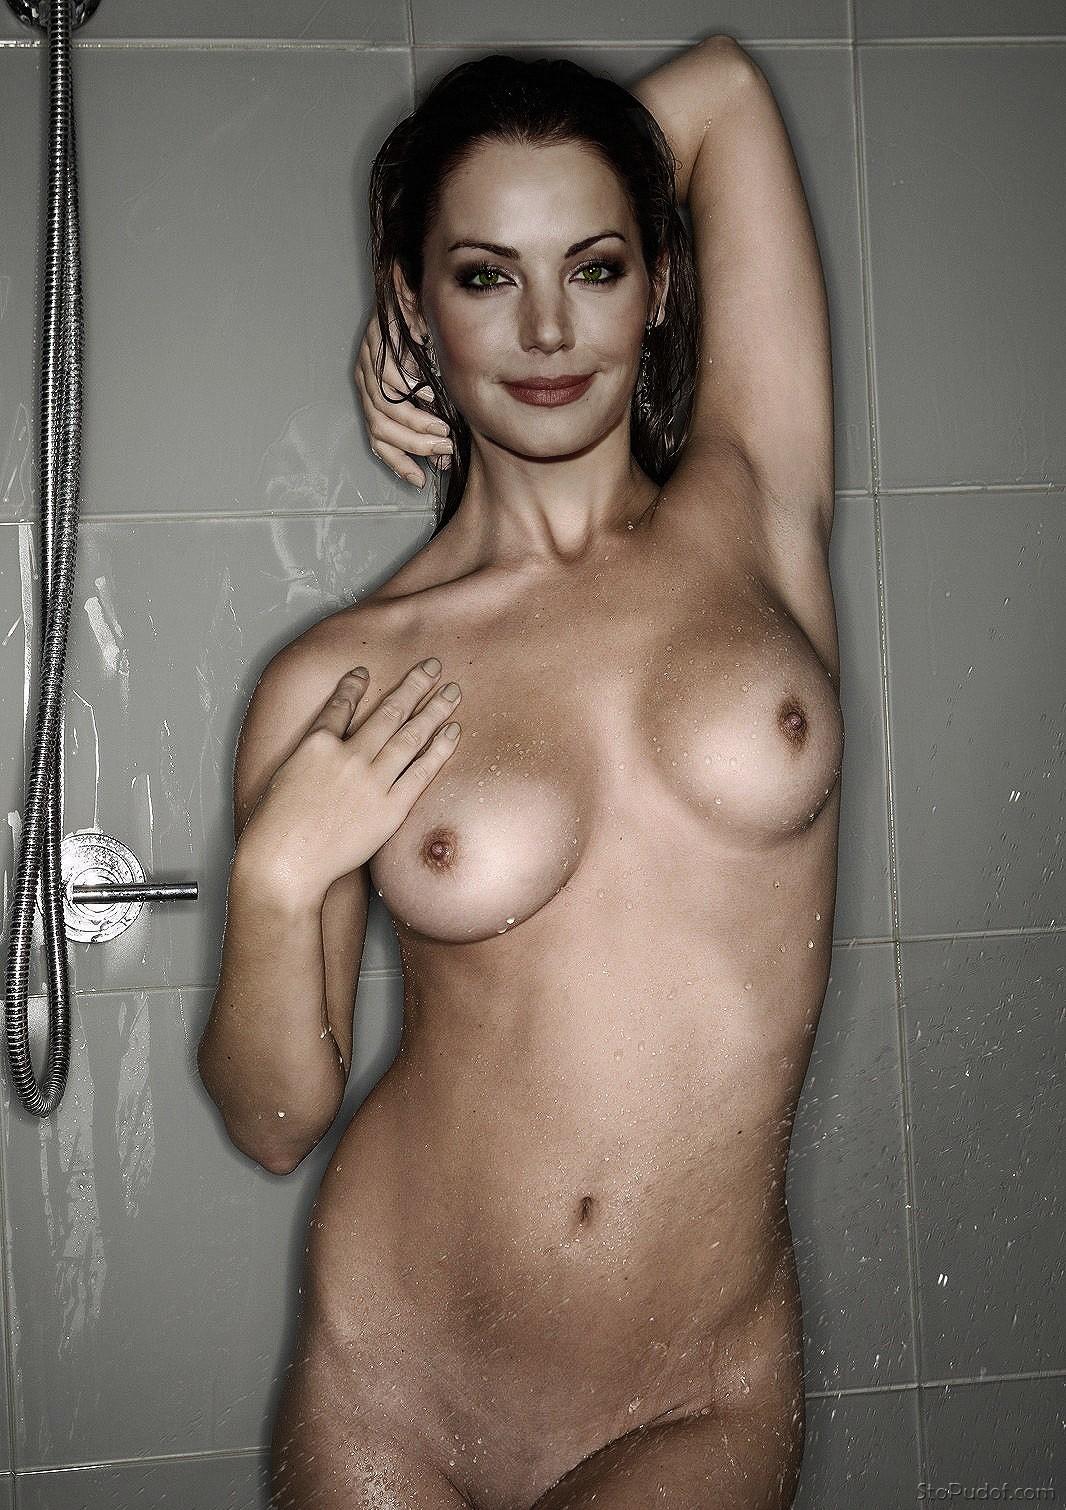 Halle berry, black celeb ultimate nude scene celebrity nude and sexy photos